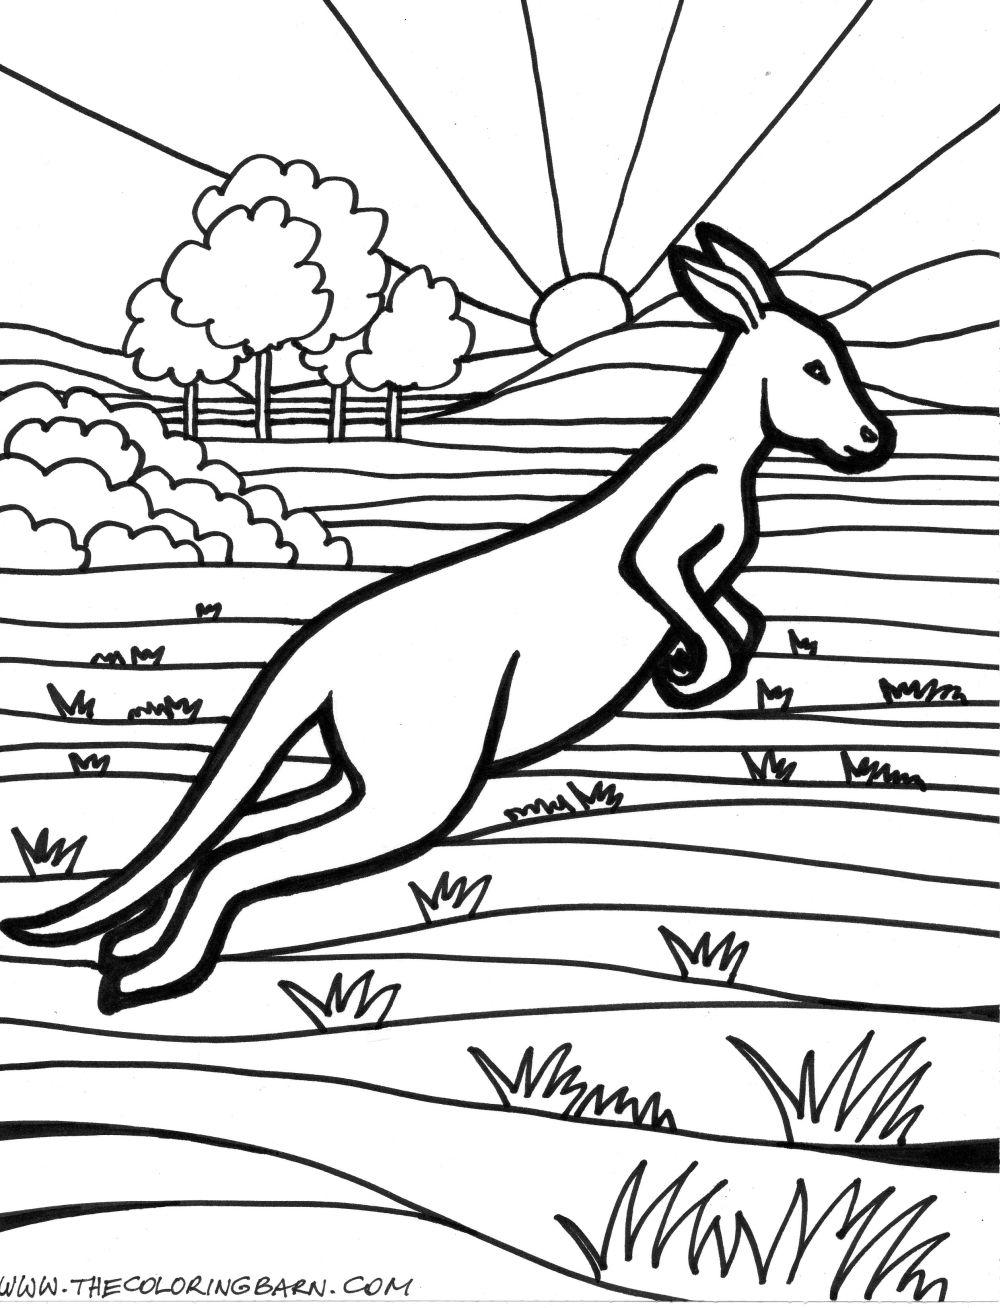 Free coloring pages kangaroo - Kangaroo Coloring Pages